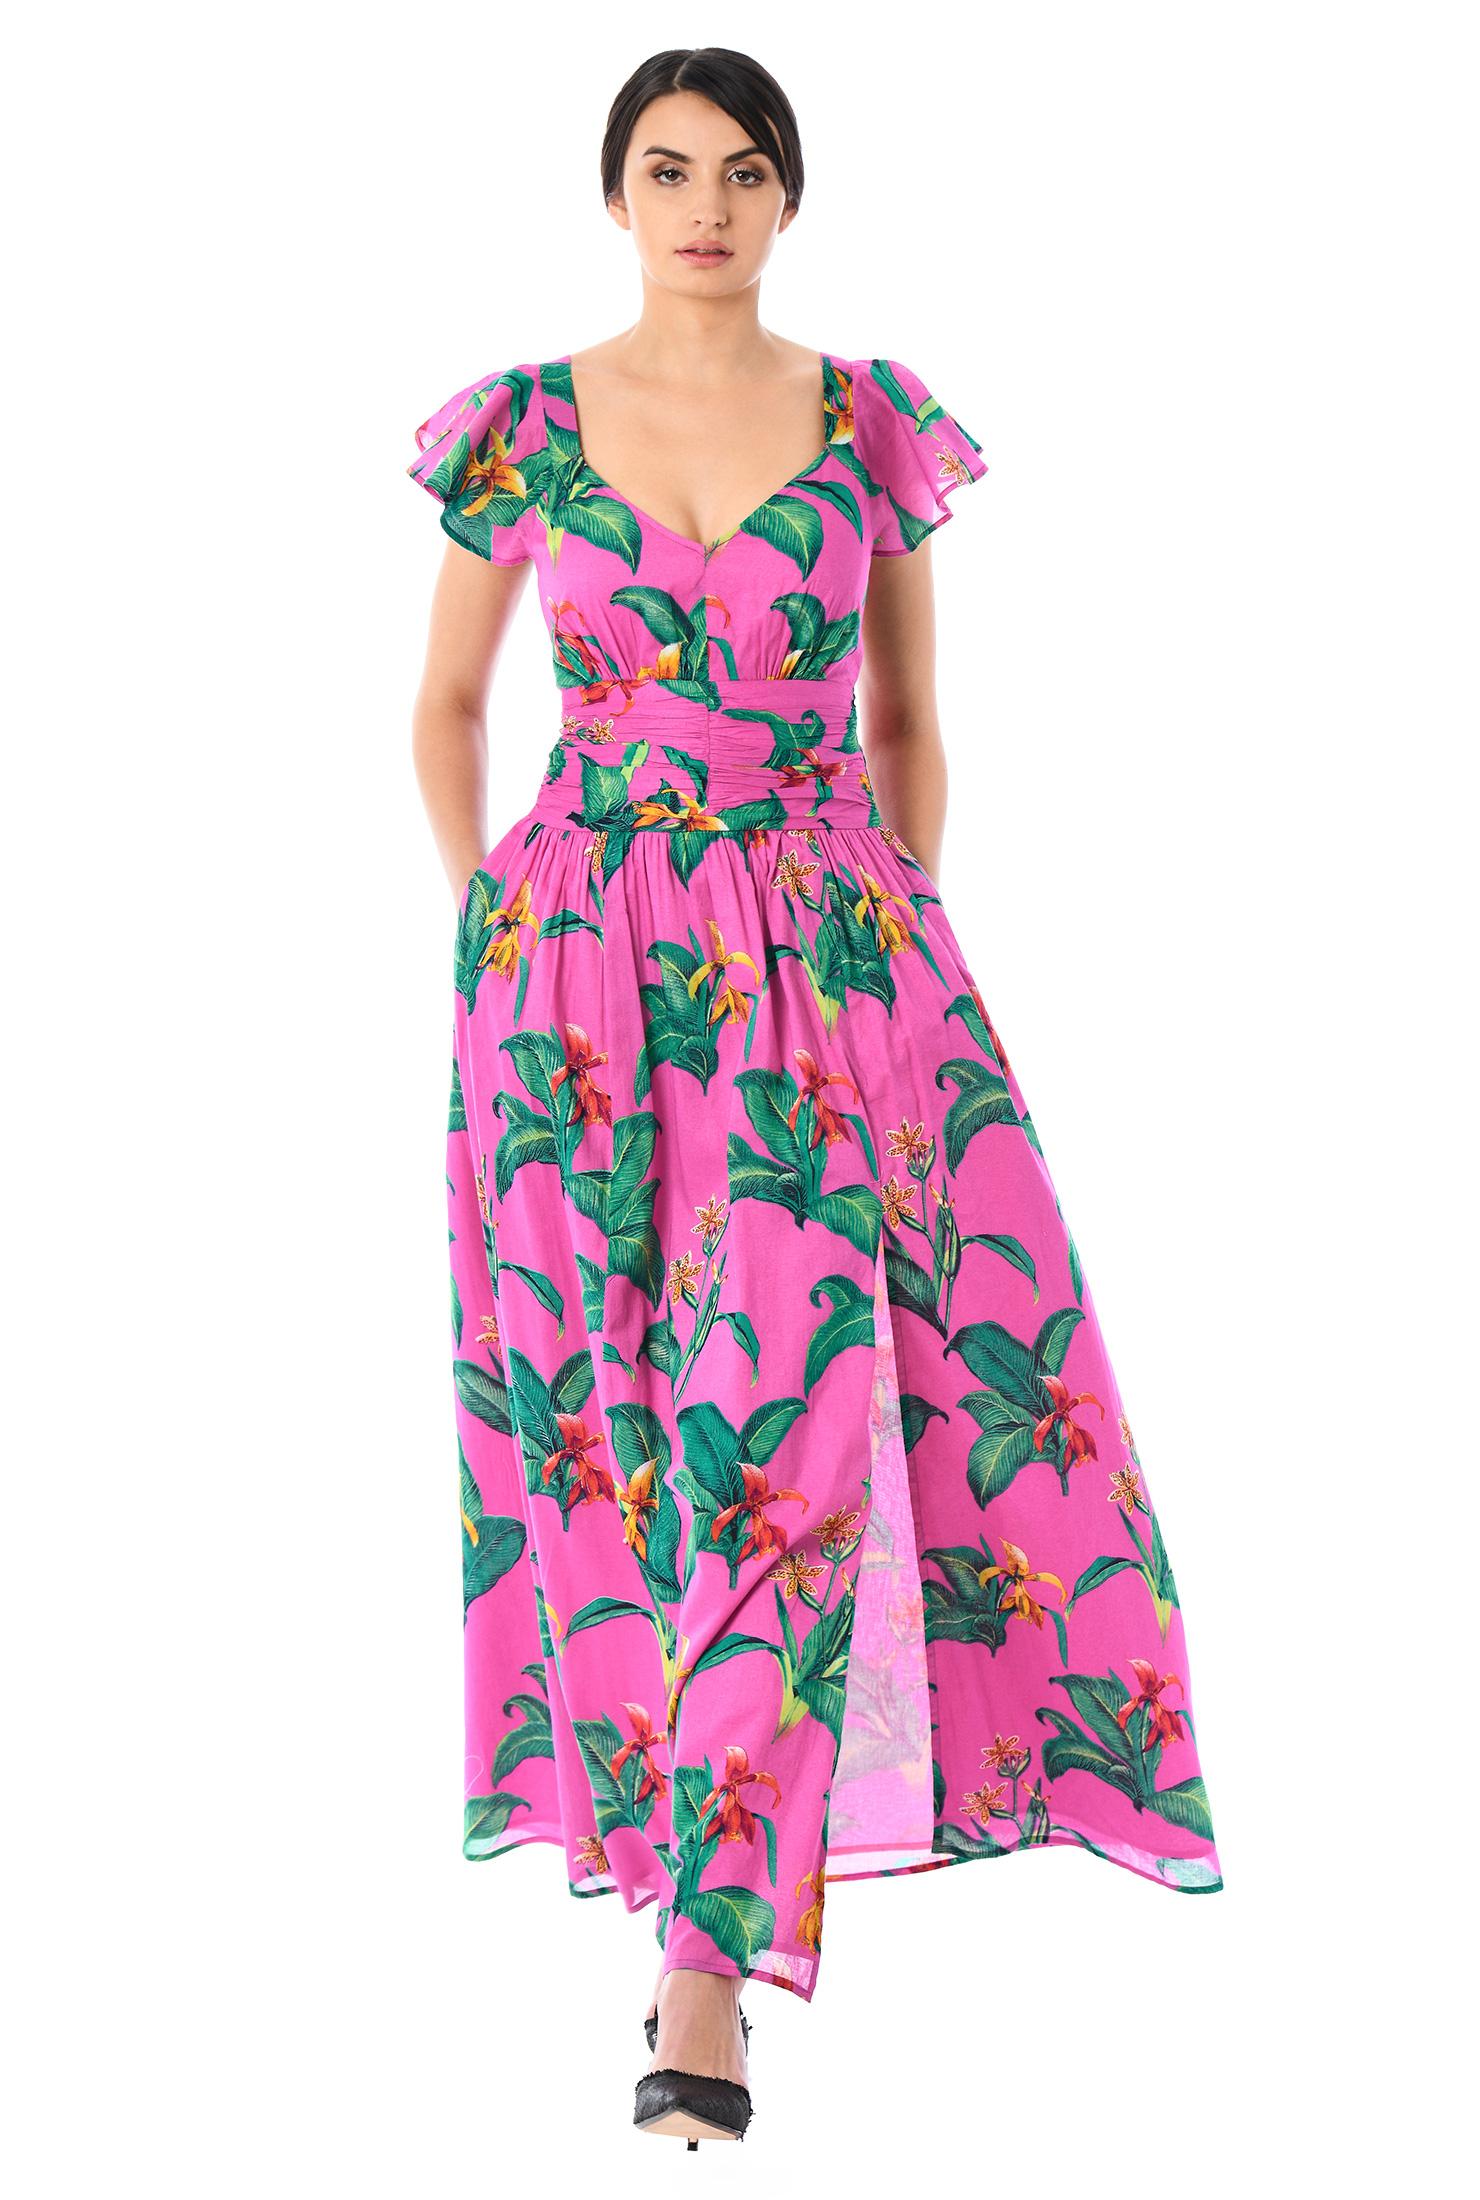 80f8e01b9139 back zip dresses, cap sleeves dresses, cotton dresses, elastic waist dresses  ,